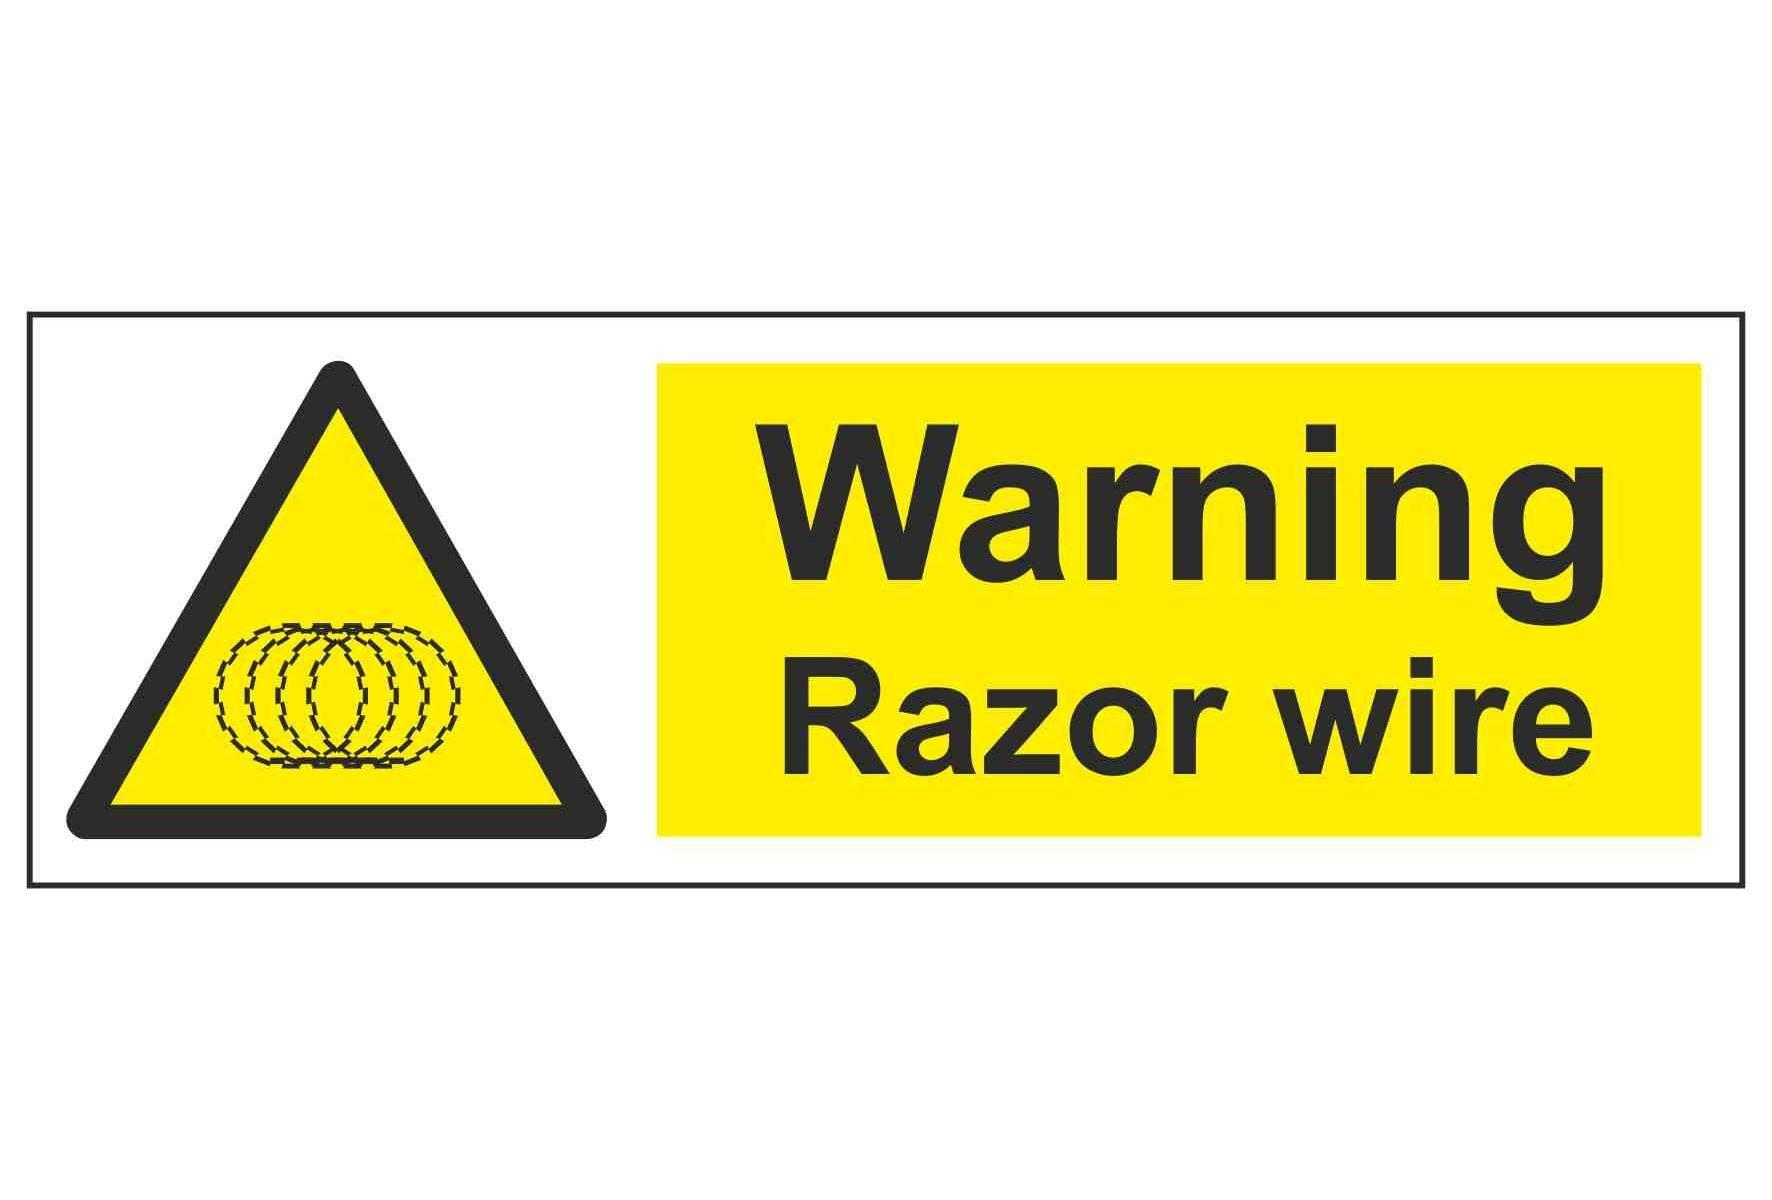 Warning Razor wire